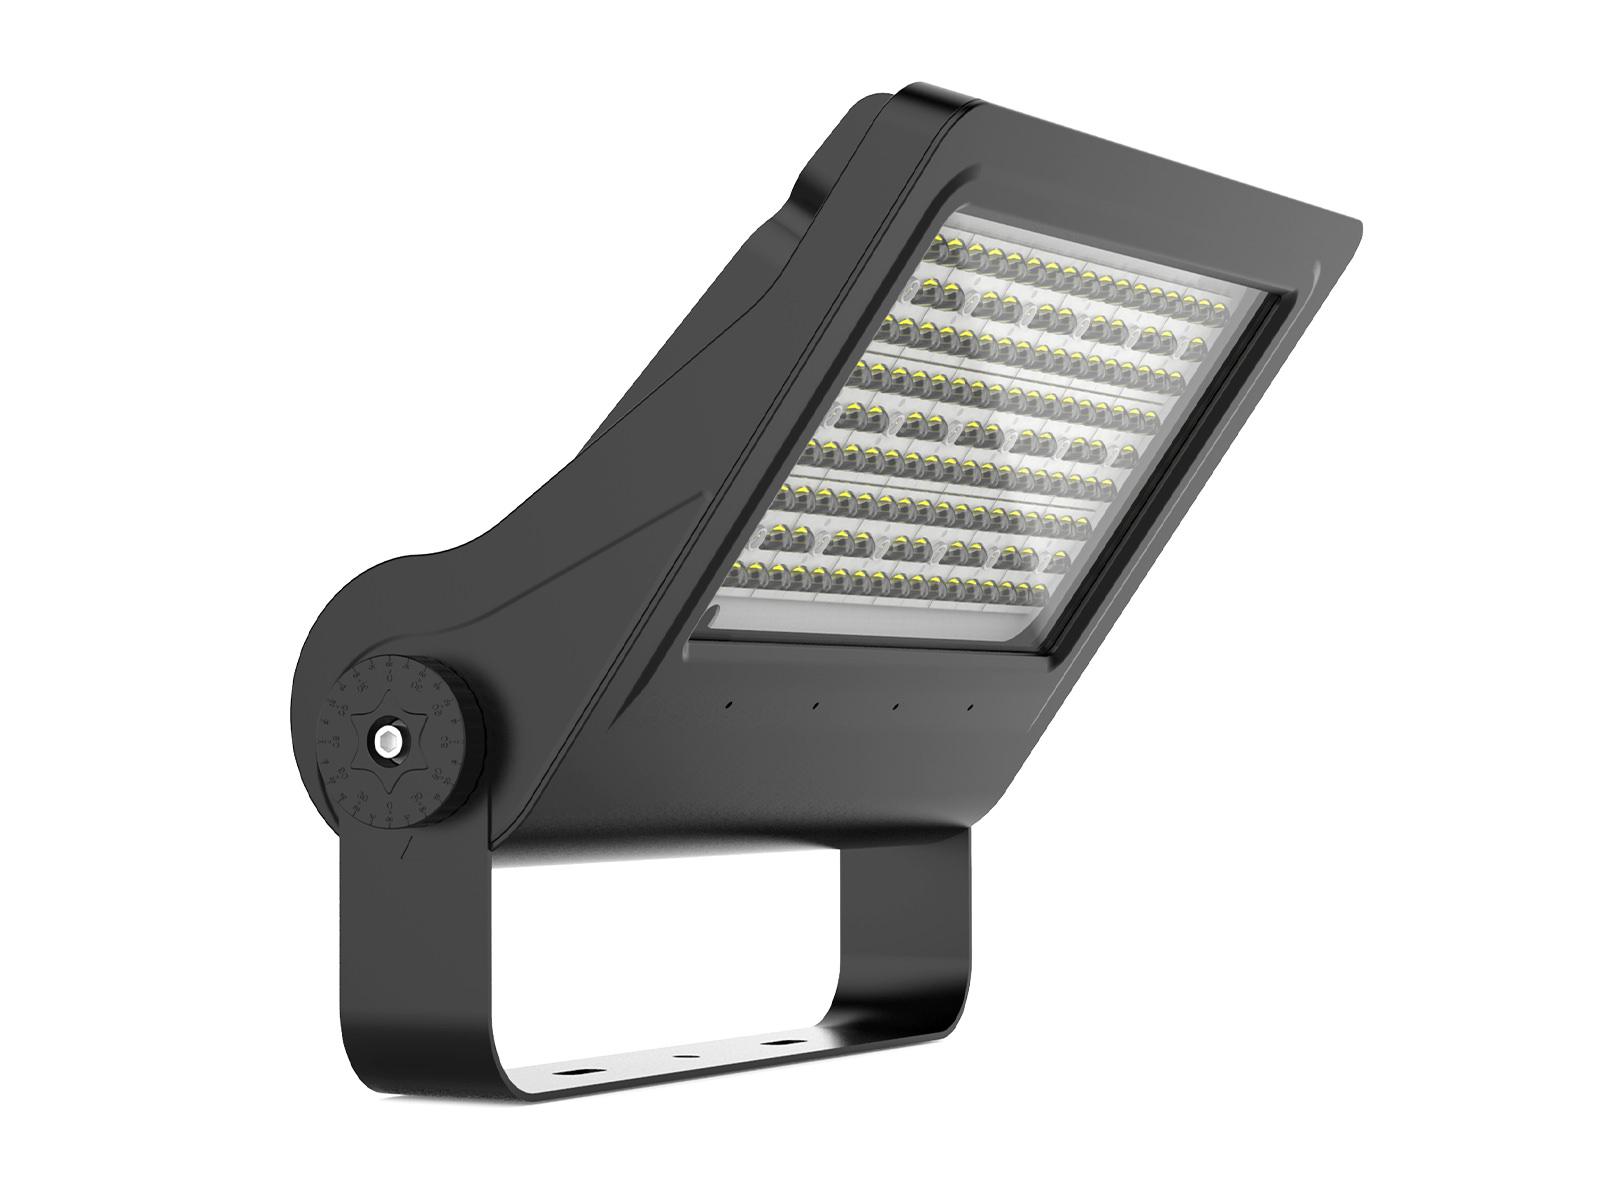 Hismooth led street light agc lighting hiboard led flood light arubaitofo Image collections